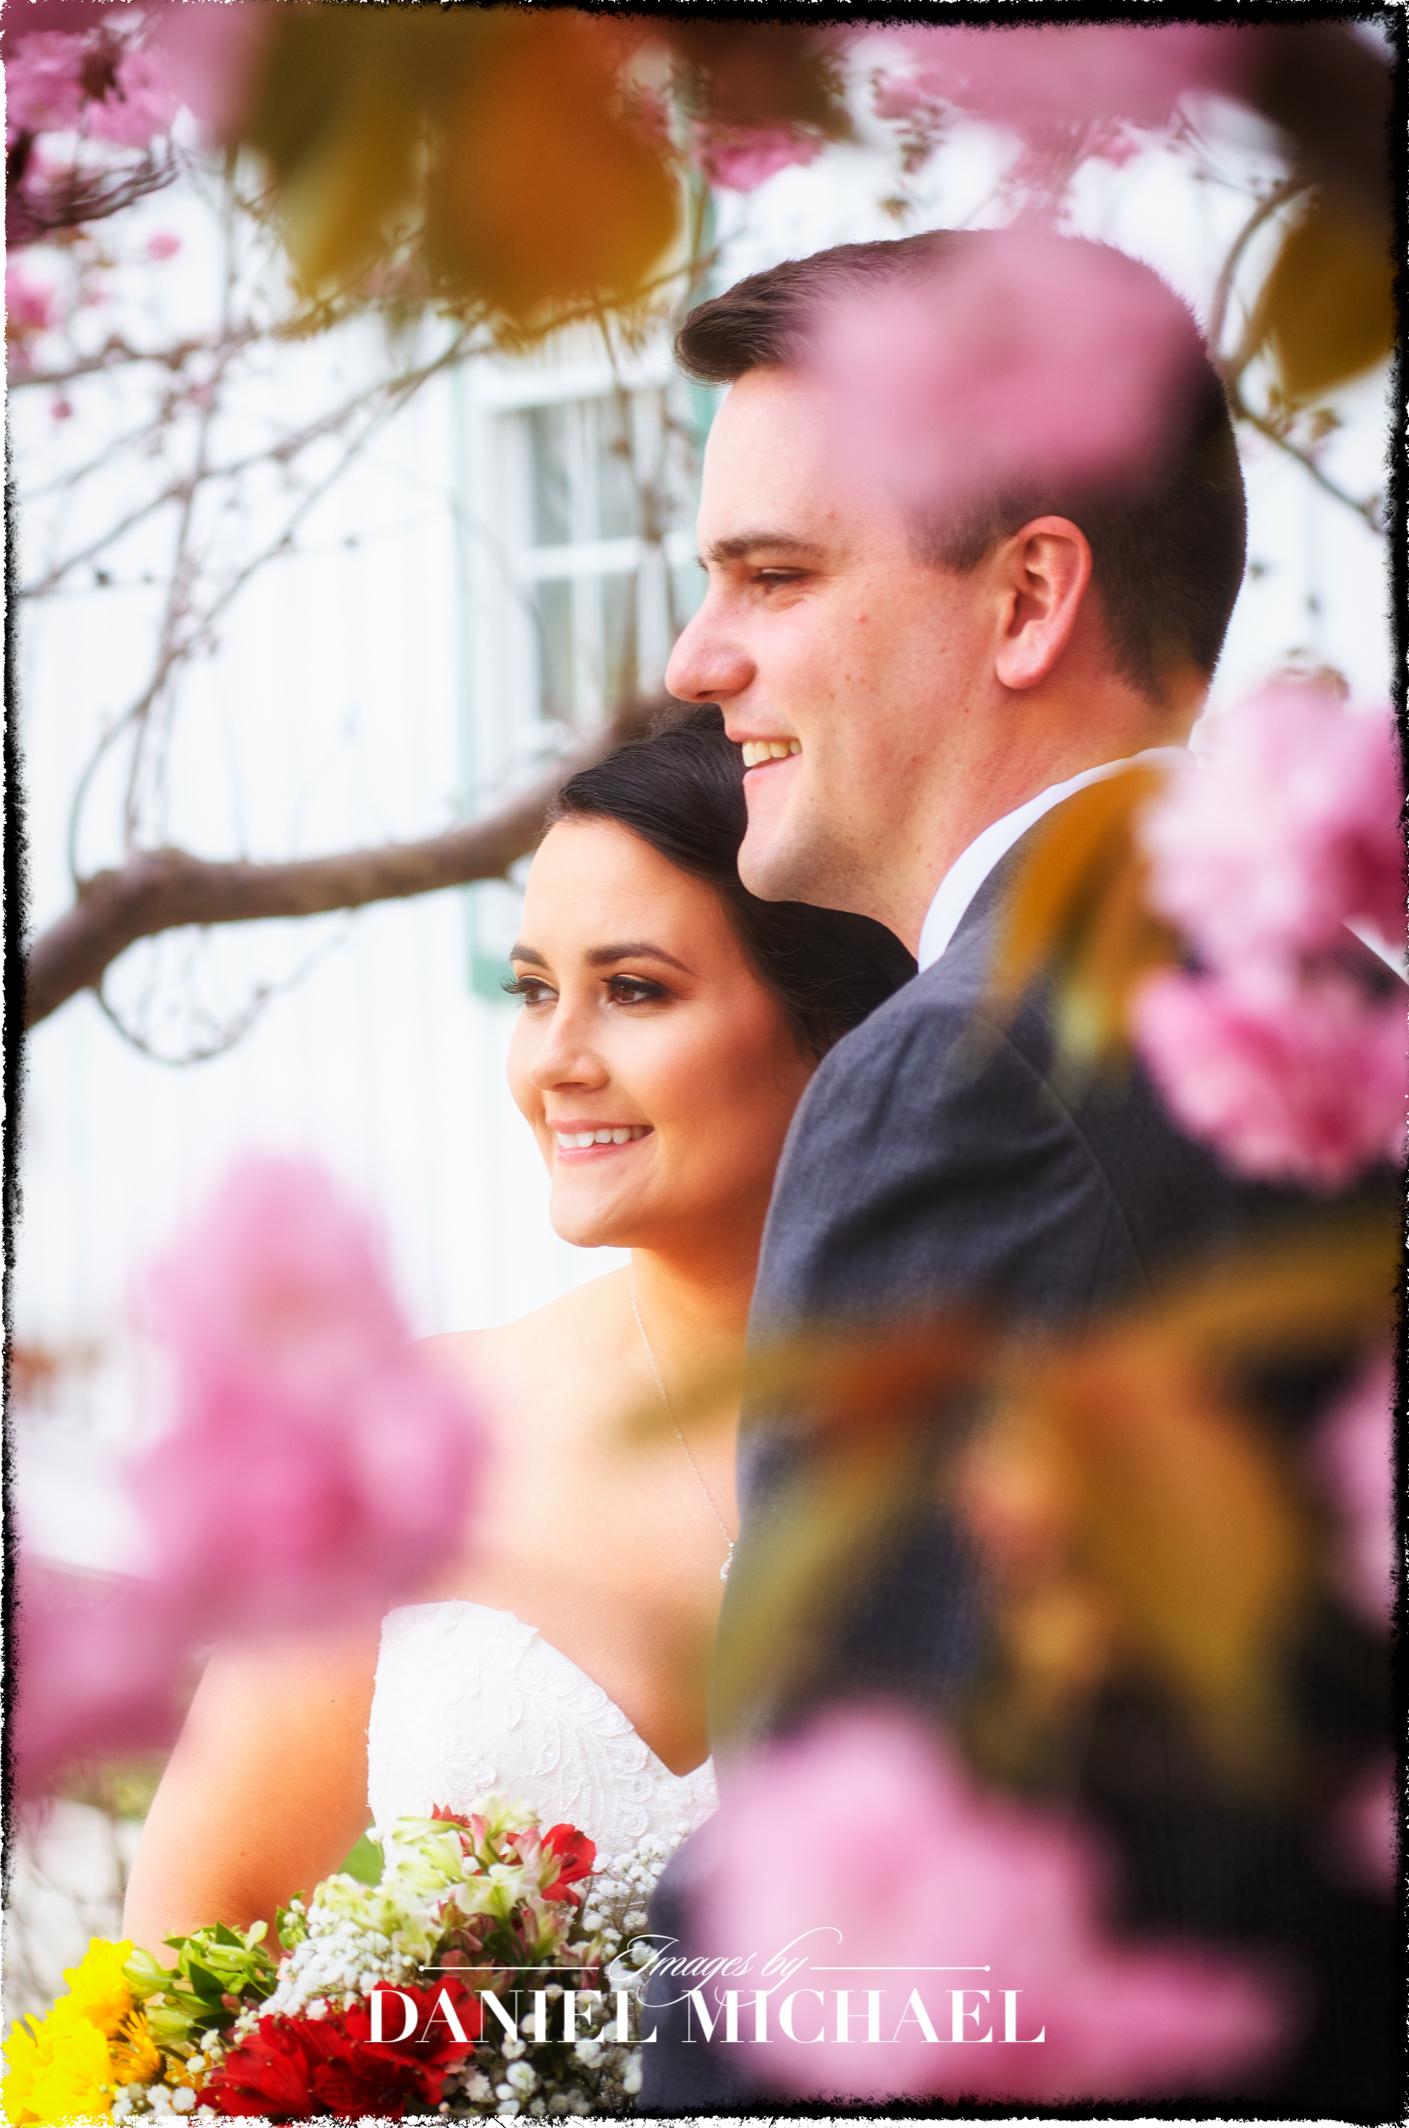 Muhlhauser Barn Ceremony Wedding Photographer